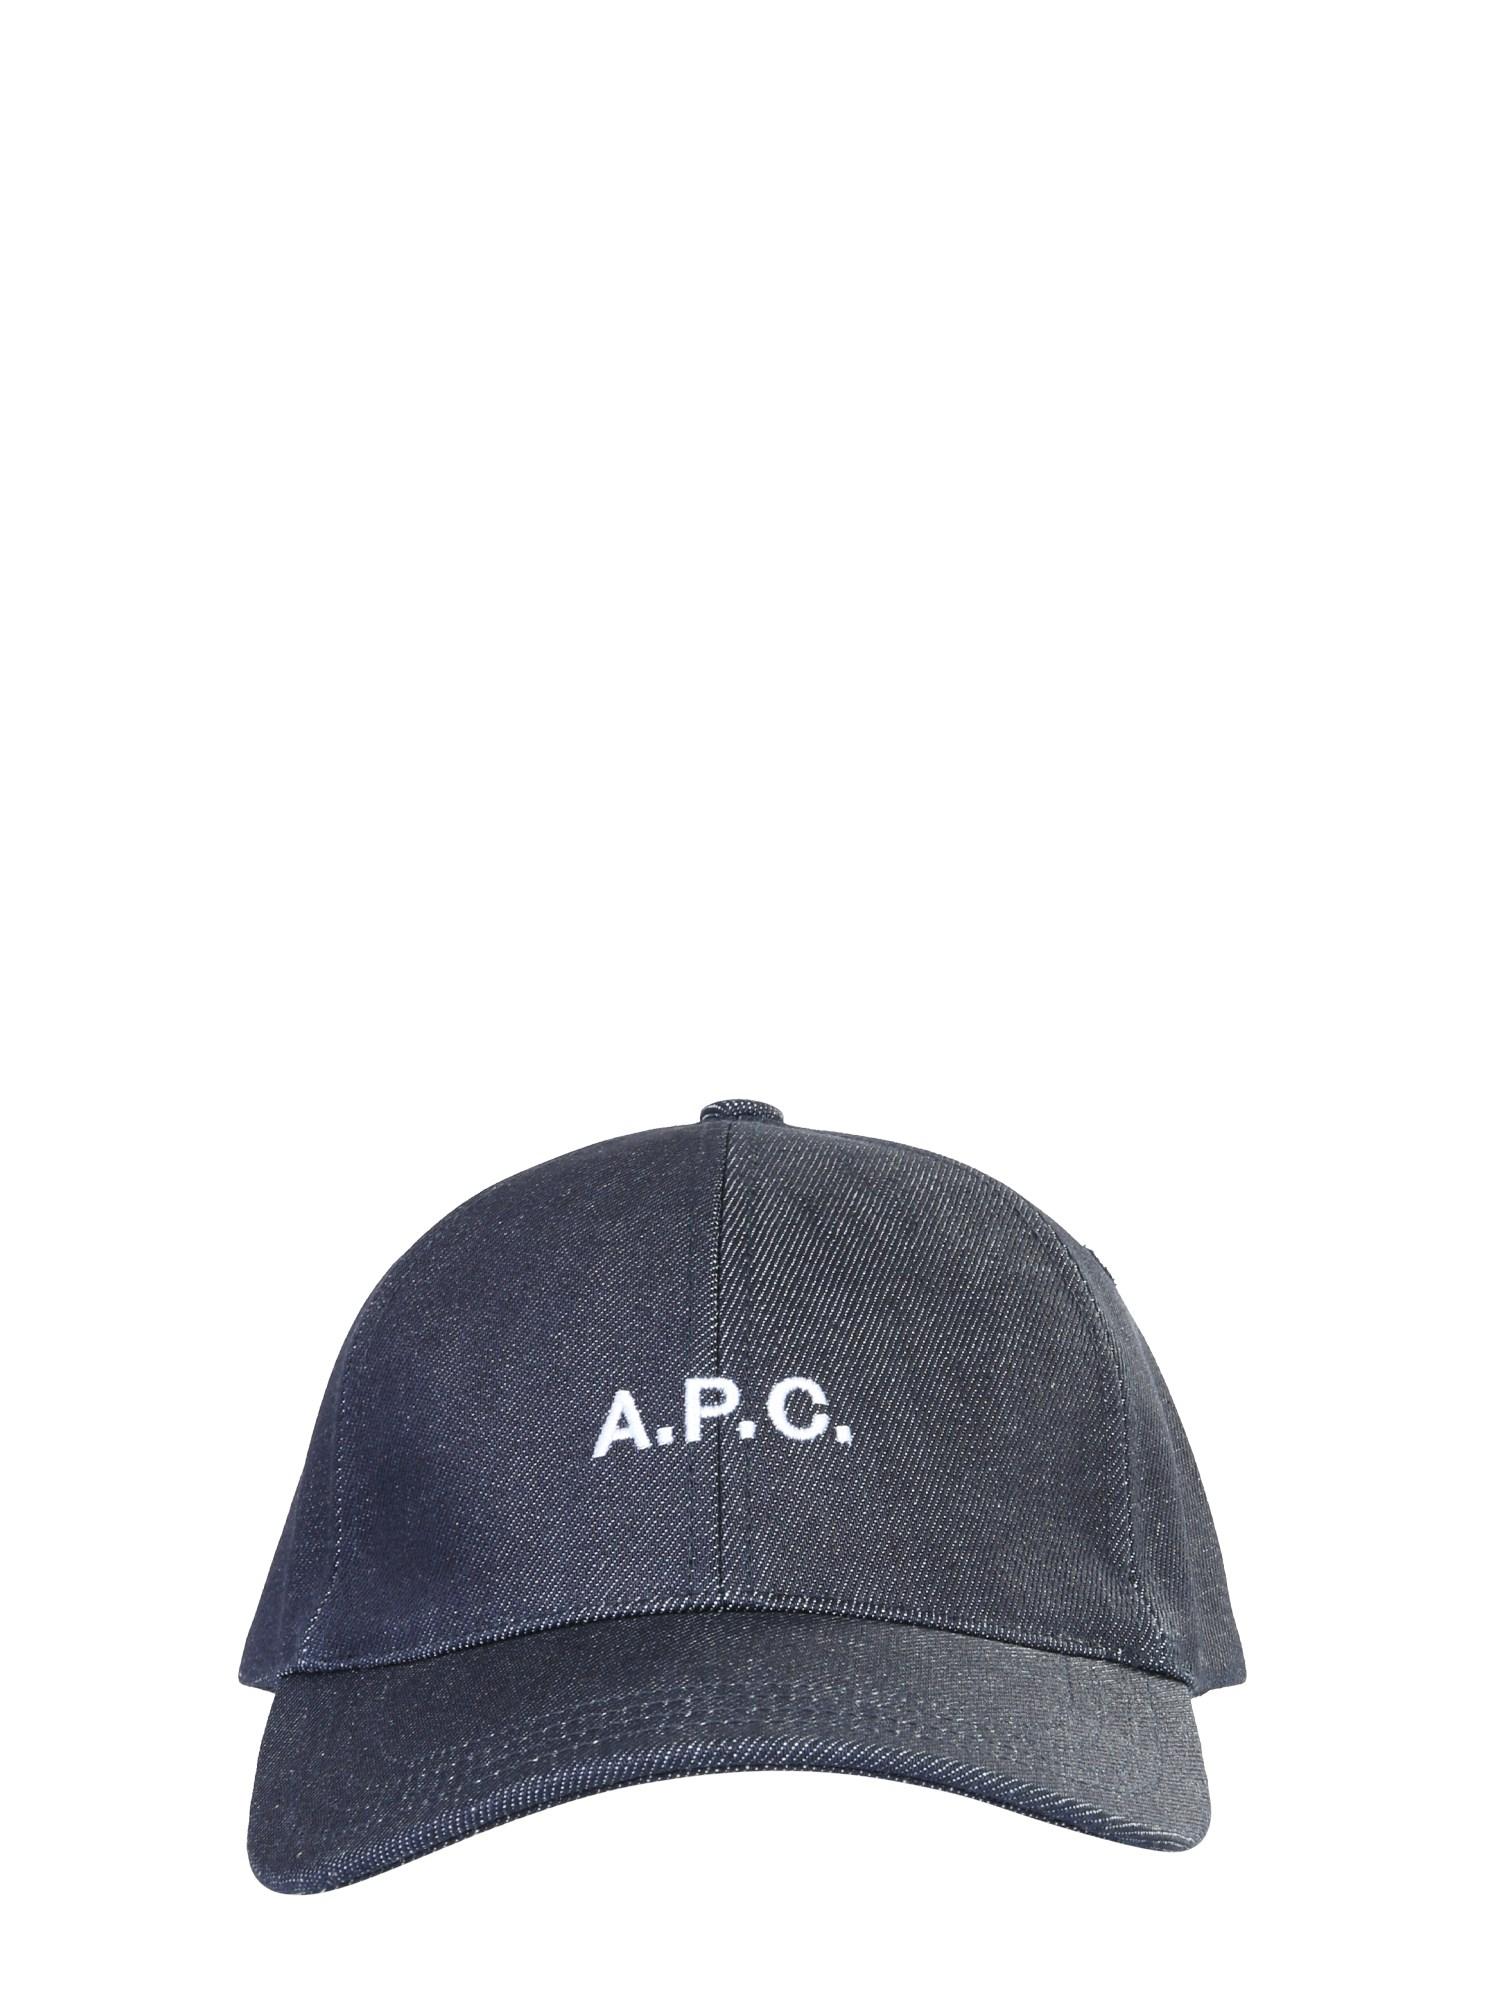 A.p.c. CHARLIE BASEBALL HAT